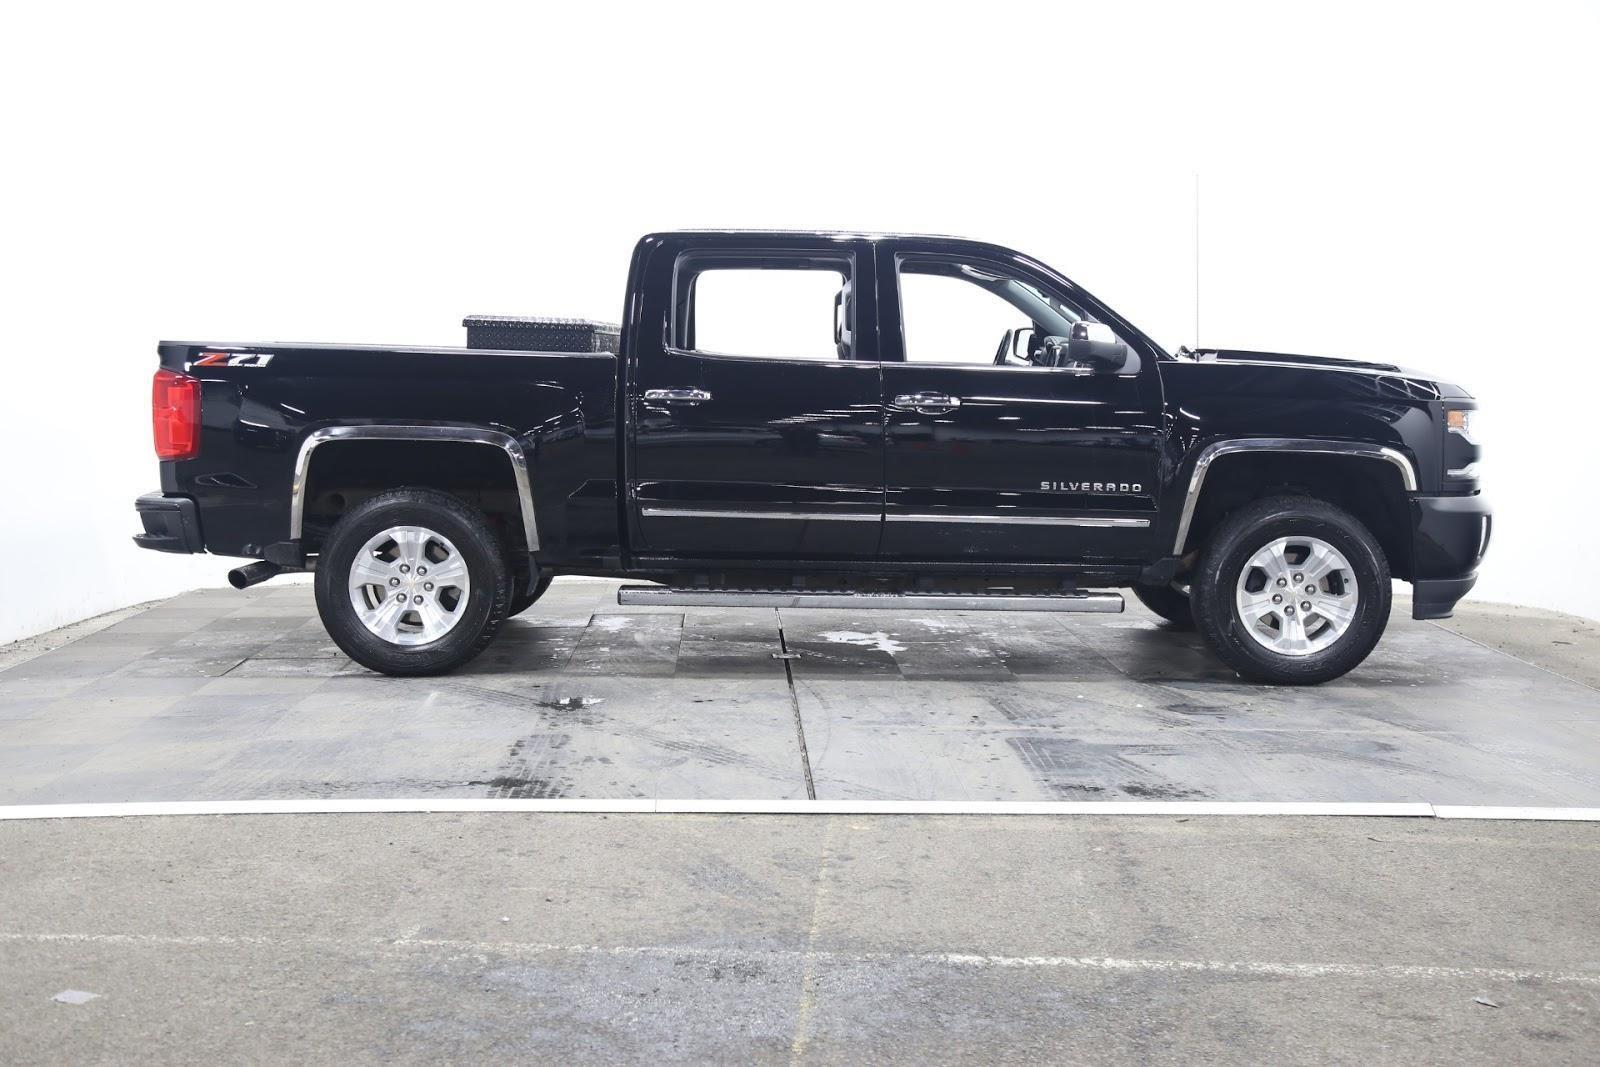 2018 Chevrolet Silverado 1500 (from $41,950)